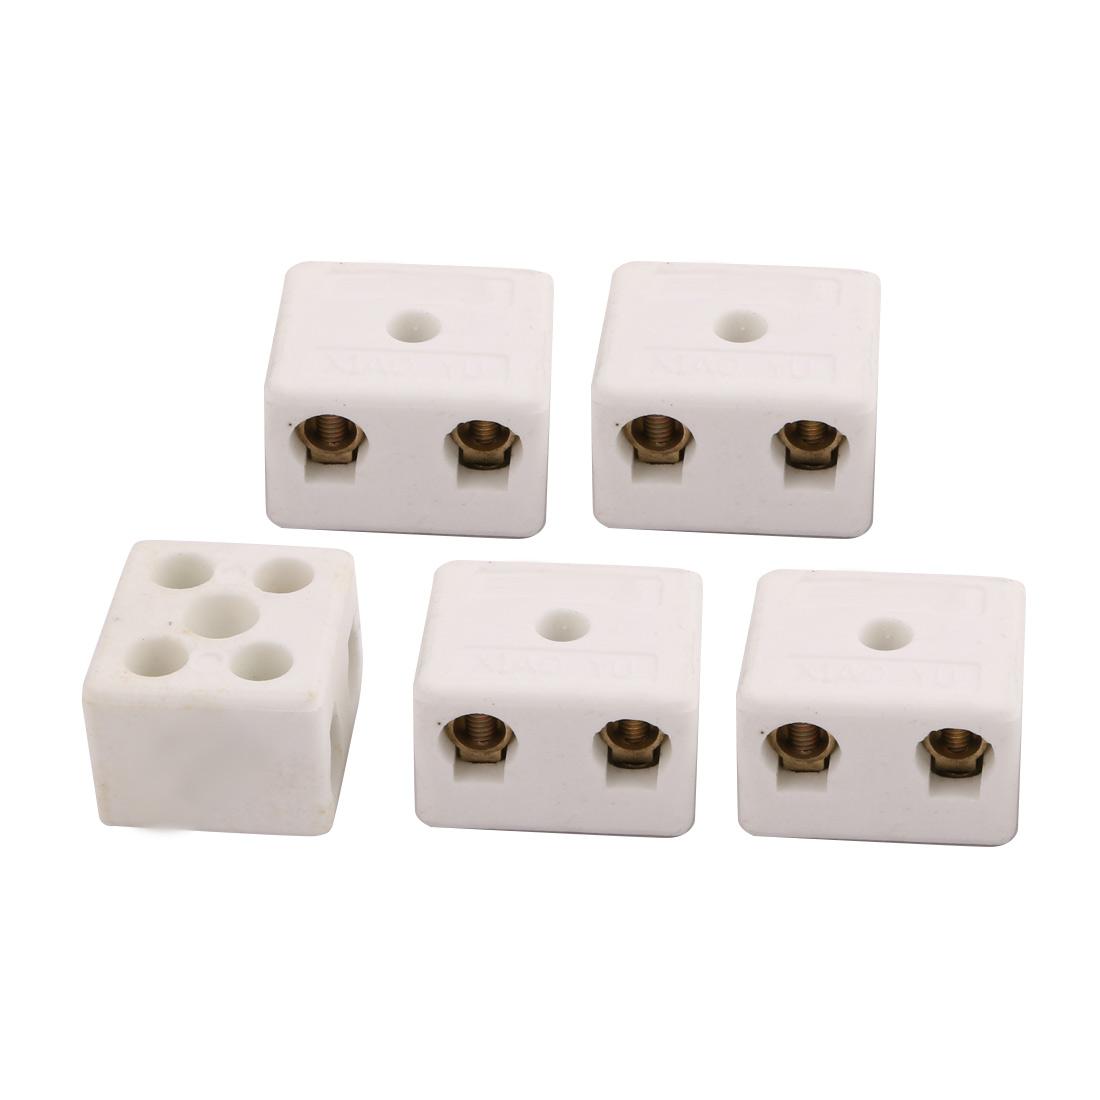 250V 15A 100W 2 Position 5 Hole Ceramic Terminal Blocks Wire Connectors 5pcs